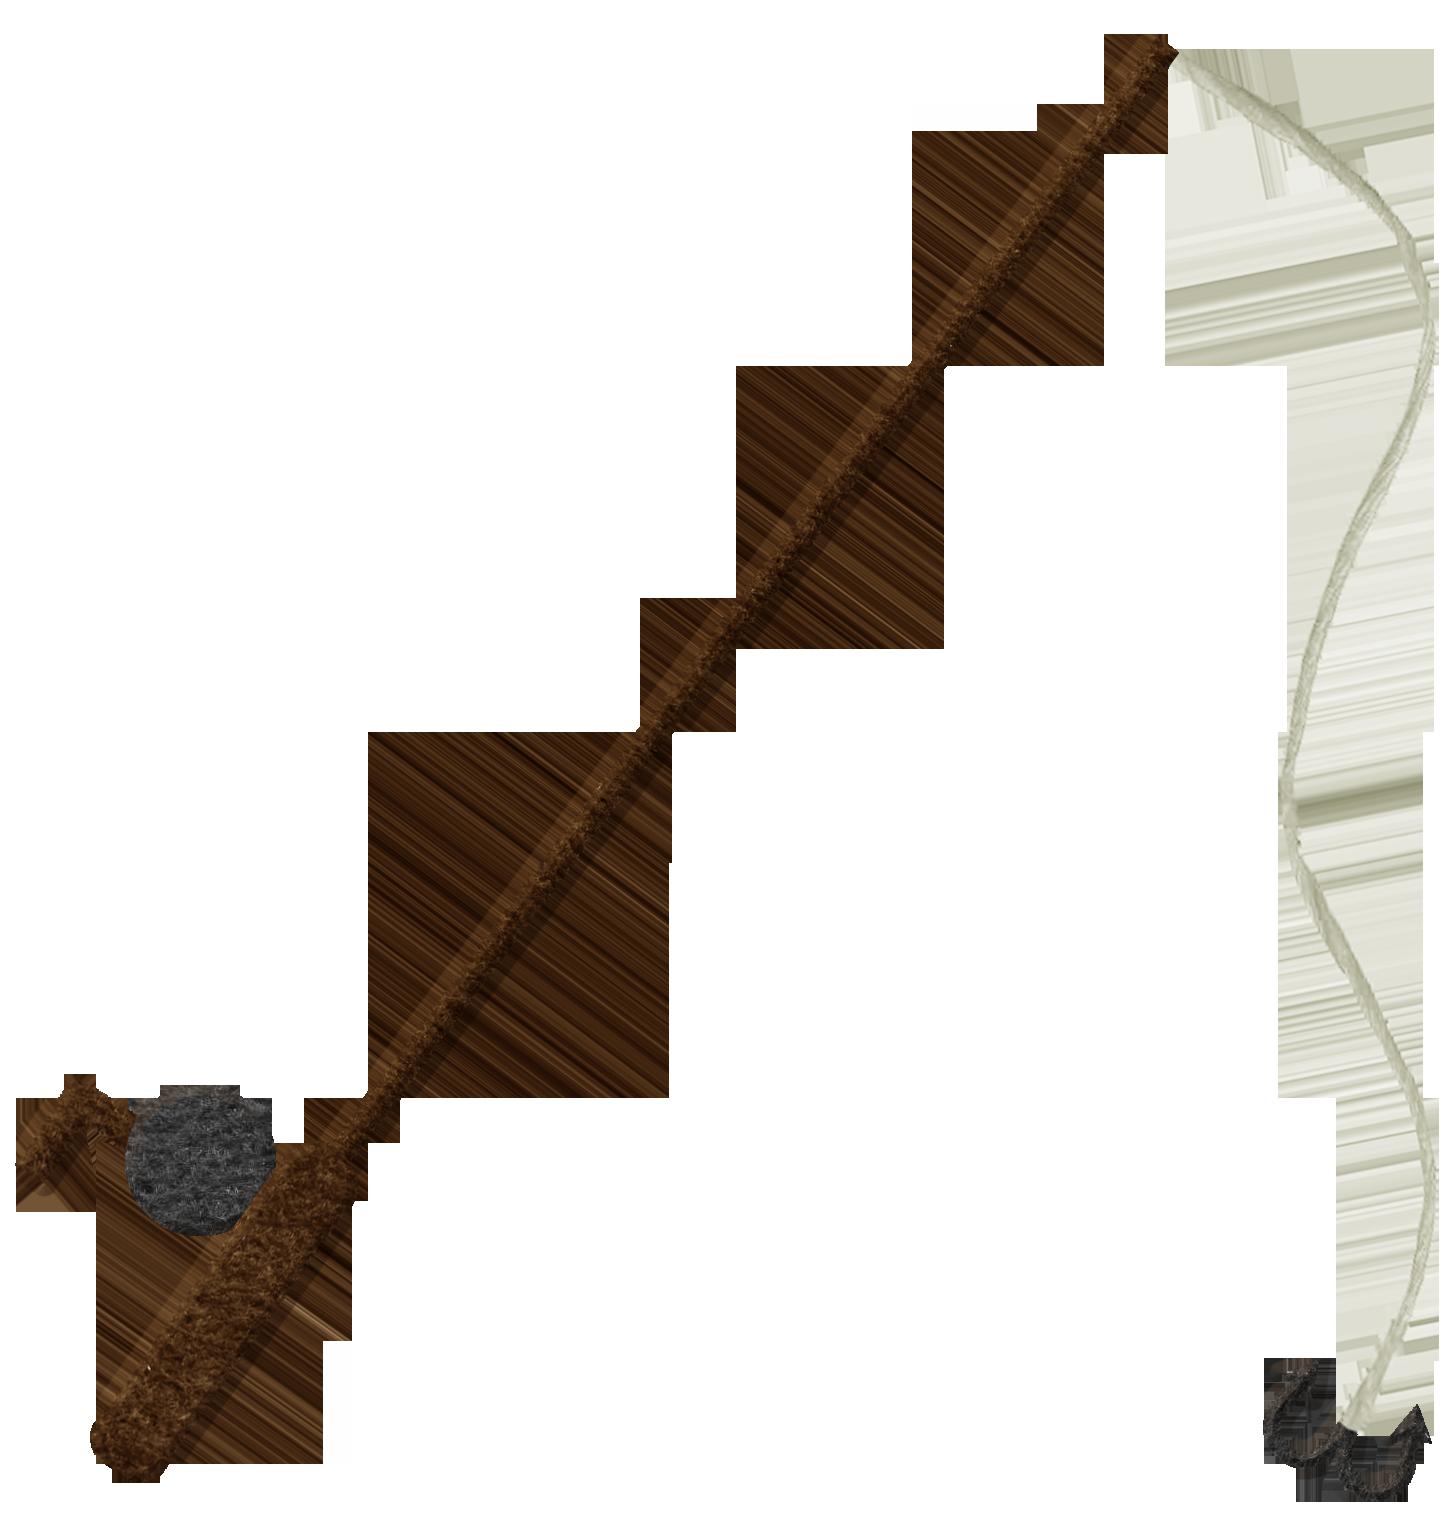 Fishing pole clipart tumundografico 4.